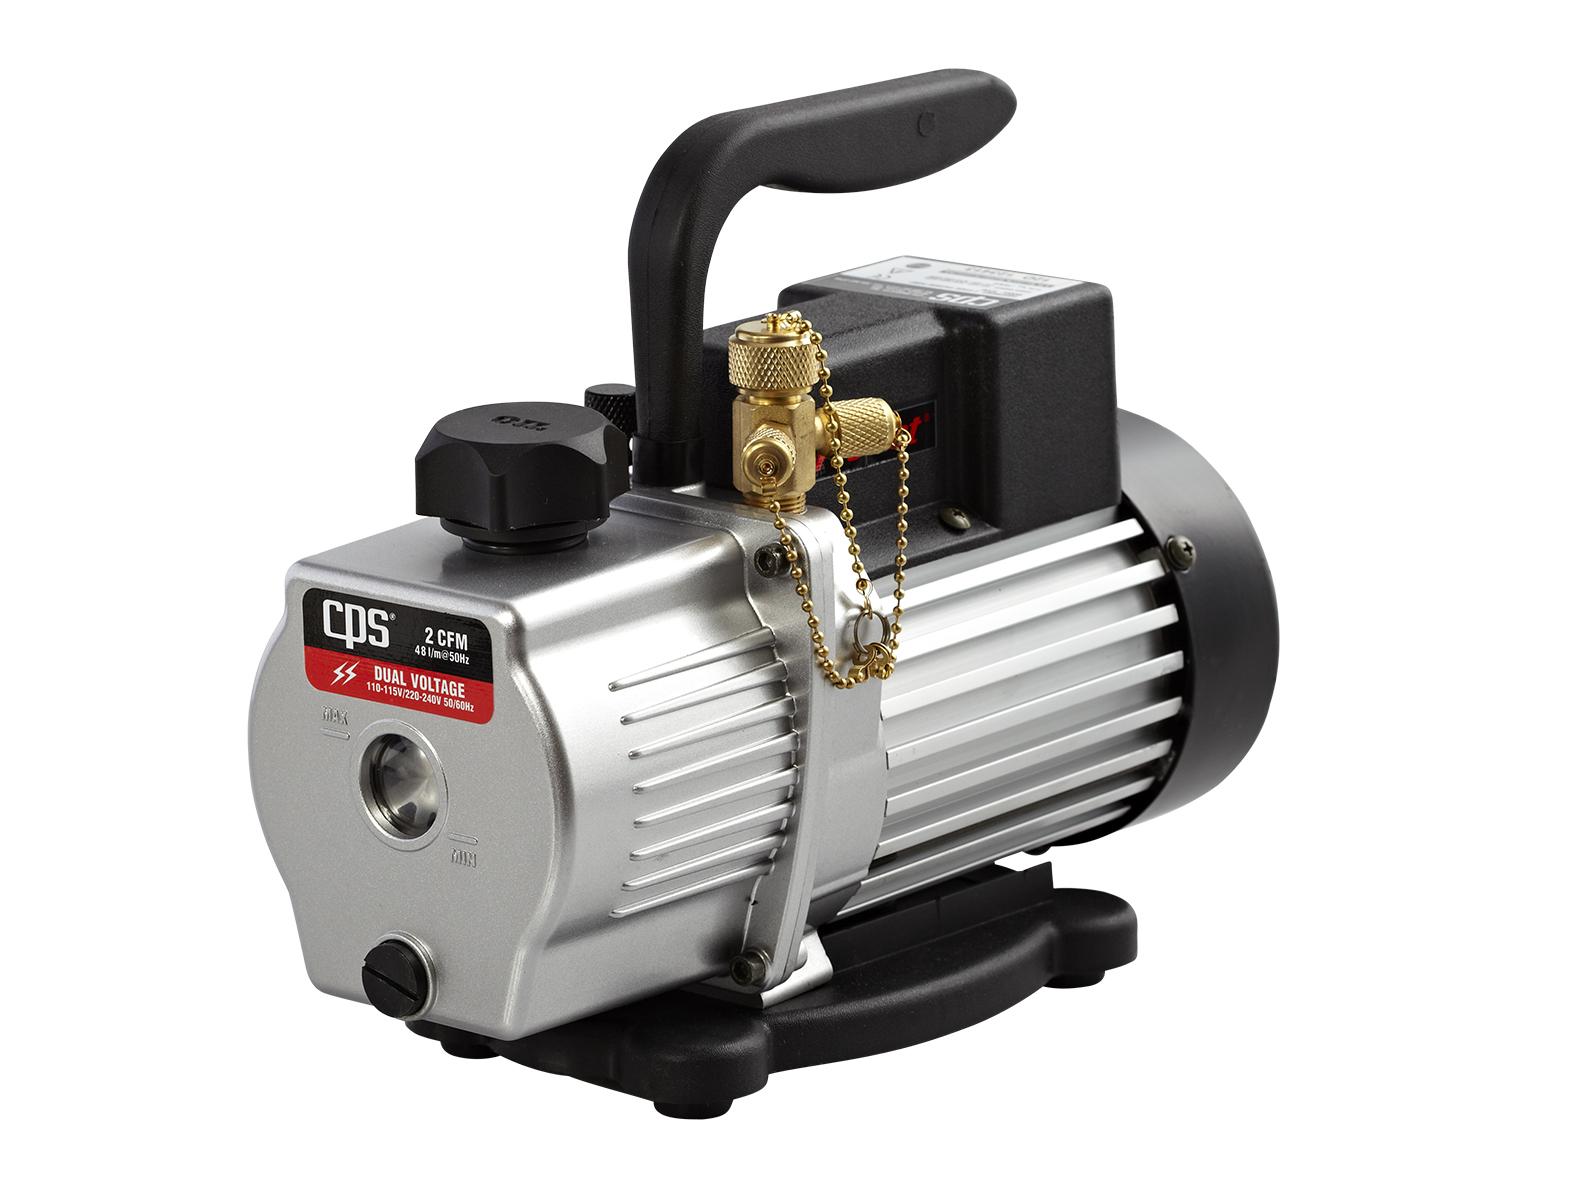 VP2D | Pro-Set® 2 CFM Vacuum Pump - CPS Products Inc